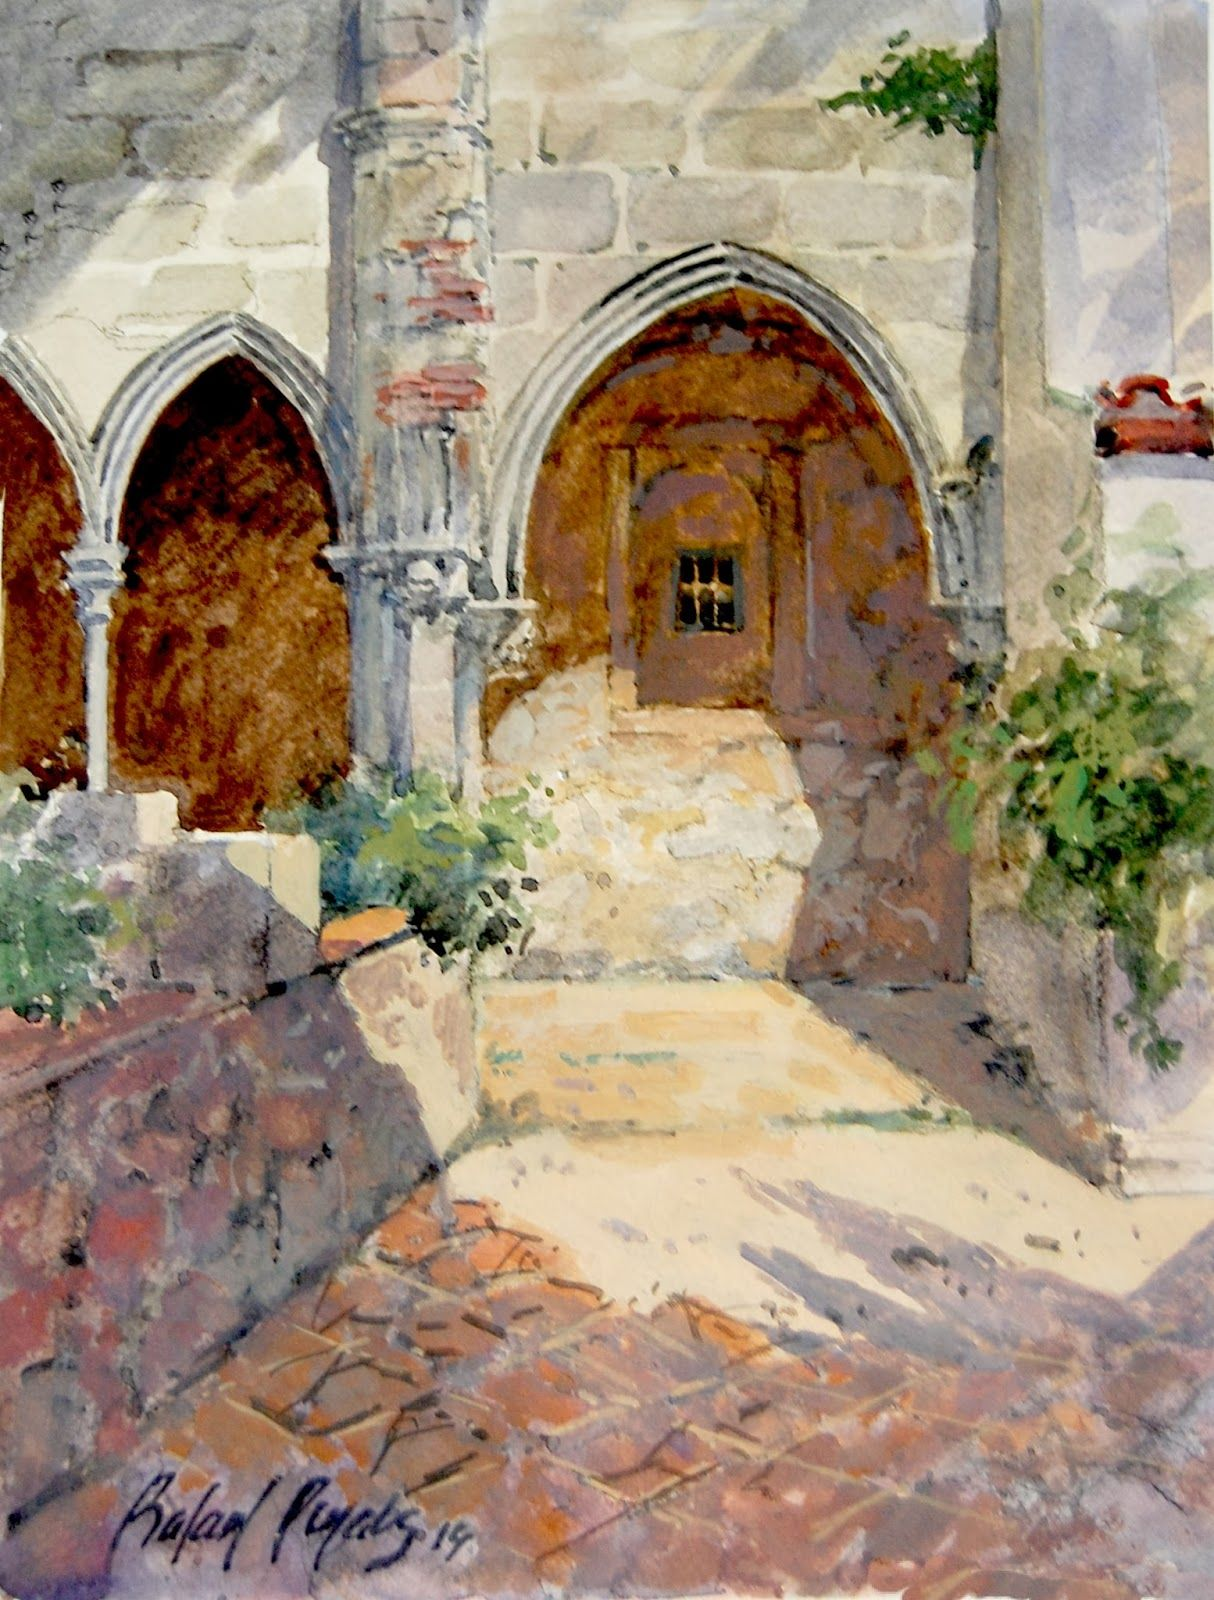 Rafael Pujals art